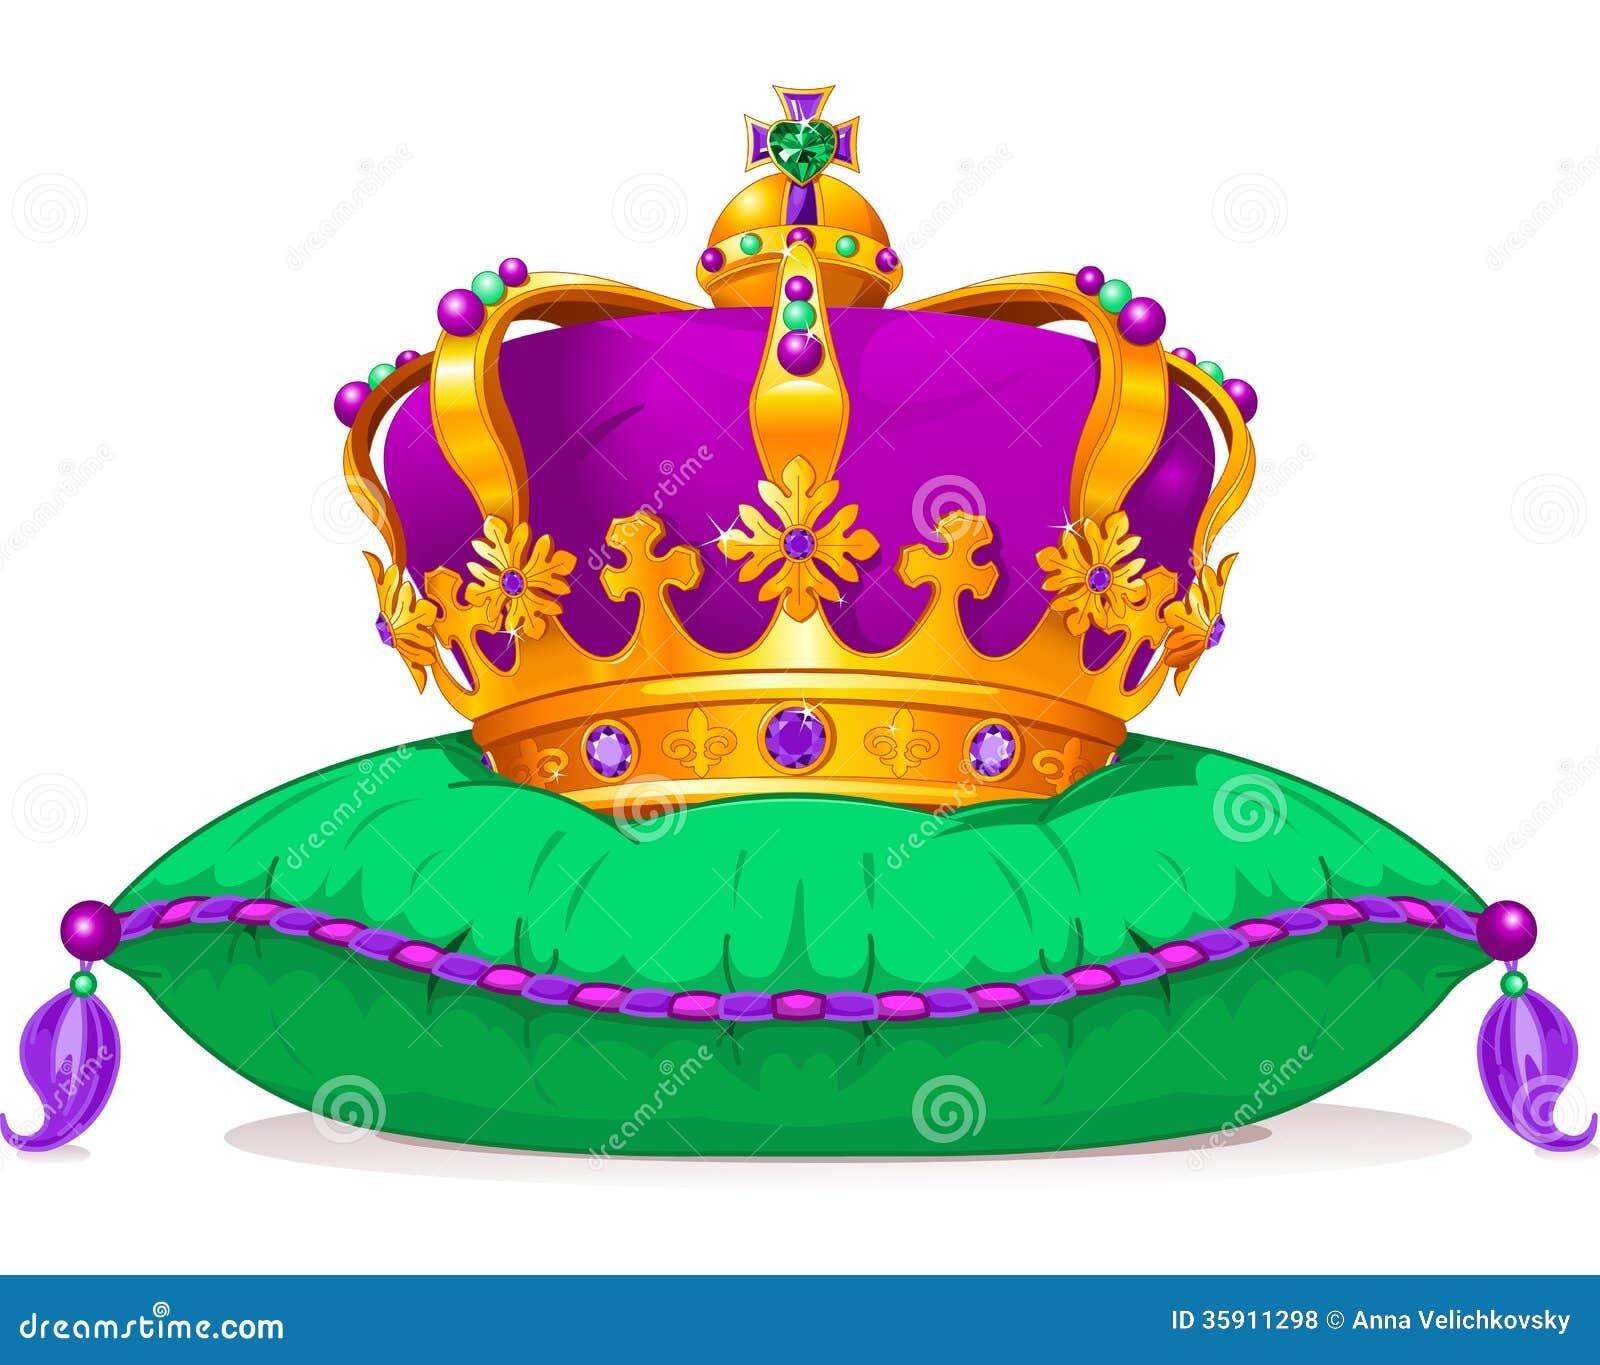 Mardi gras crown stock vector illustration of celebration 35911298 mardi gras crown buycottarizona